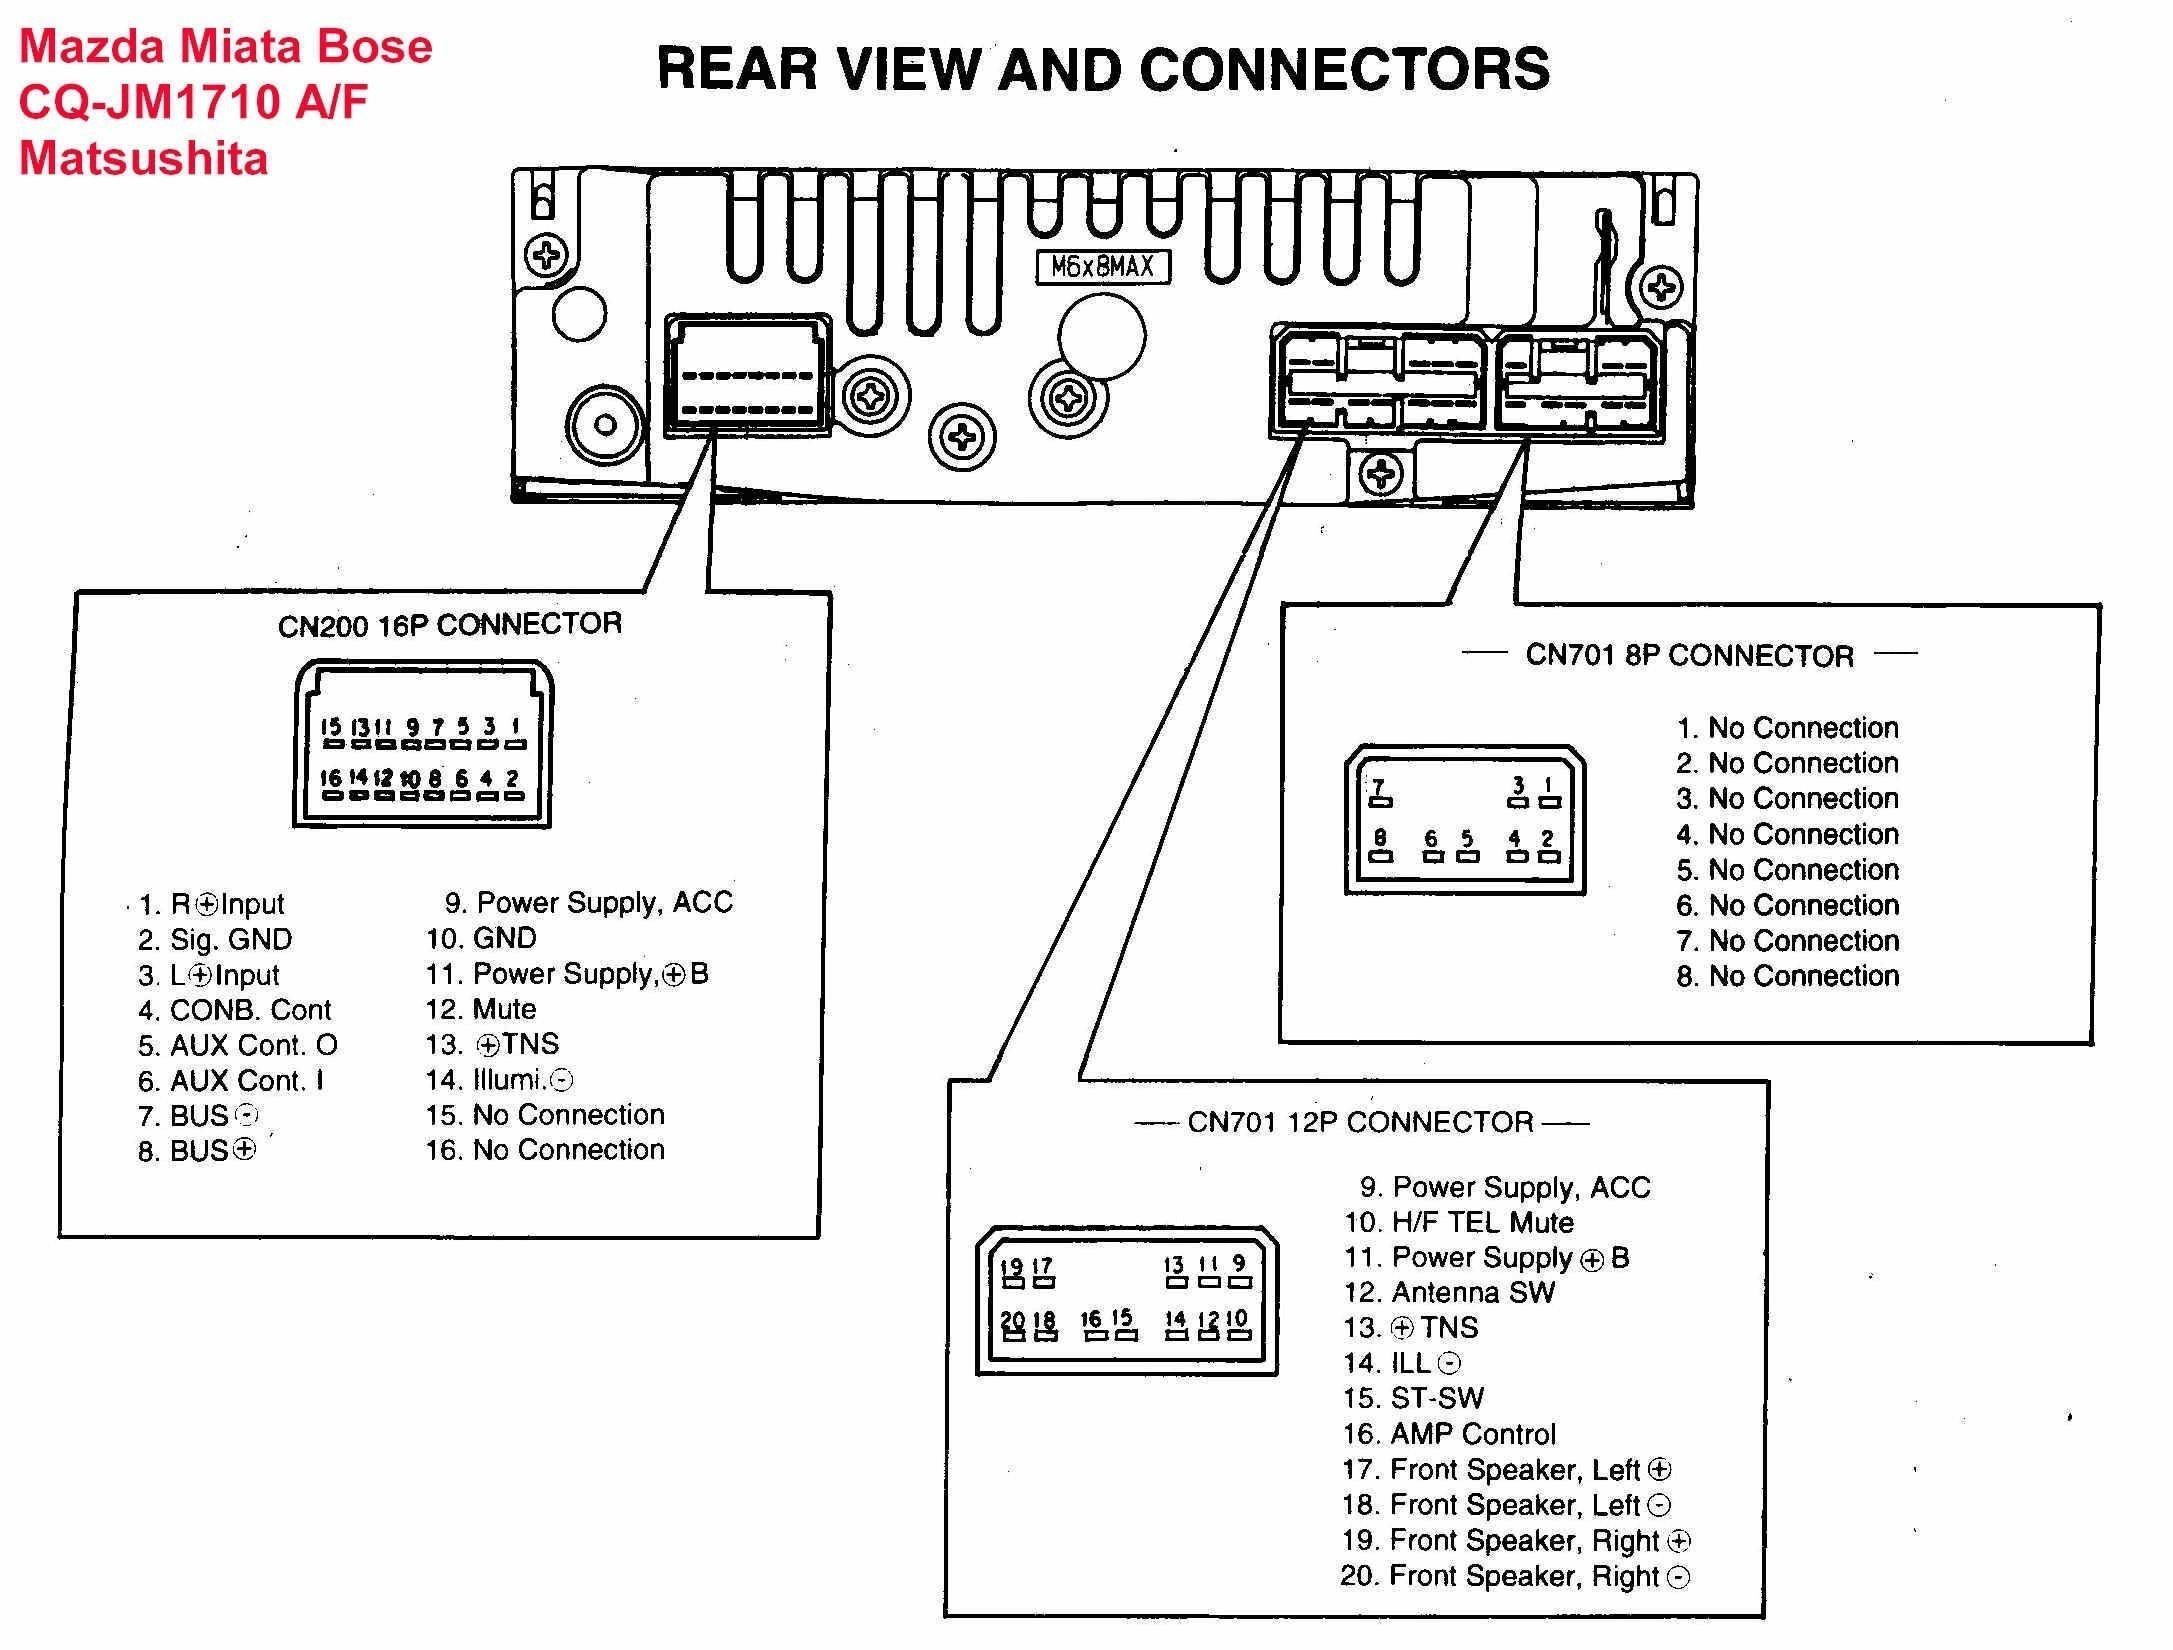 Stupendous Chevy Volt Bose Amp Wiring Diagram General Wiring Diagram Data Wiring Cloud Biosomenaidewilluminateatxorg